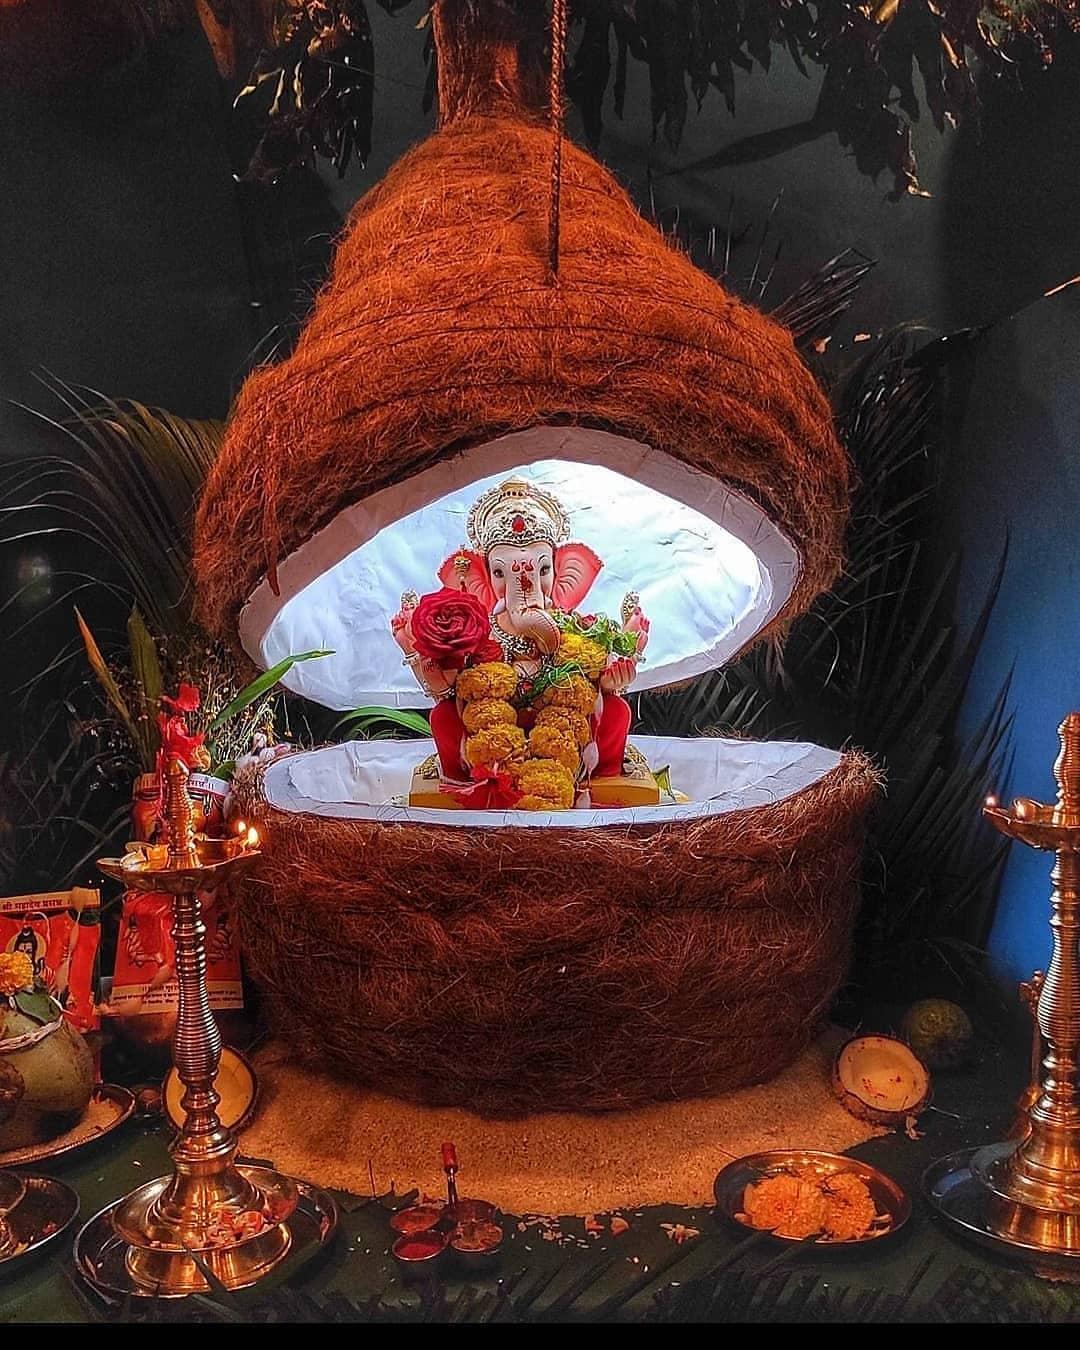 Beautifull Night Lord Ganpati Decoration Photo Wallpaper for Mobile